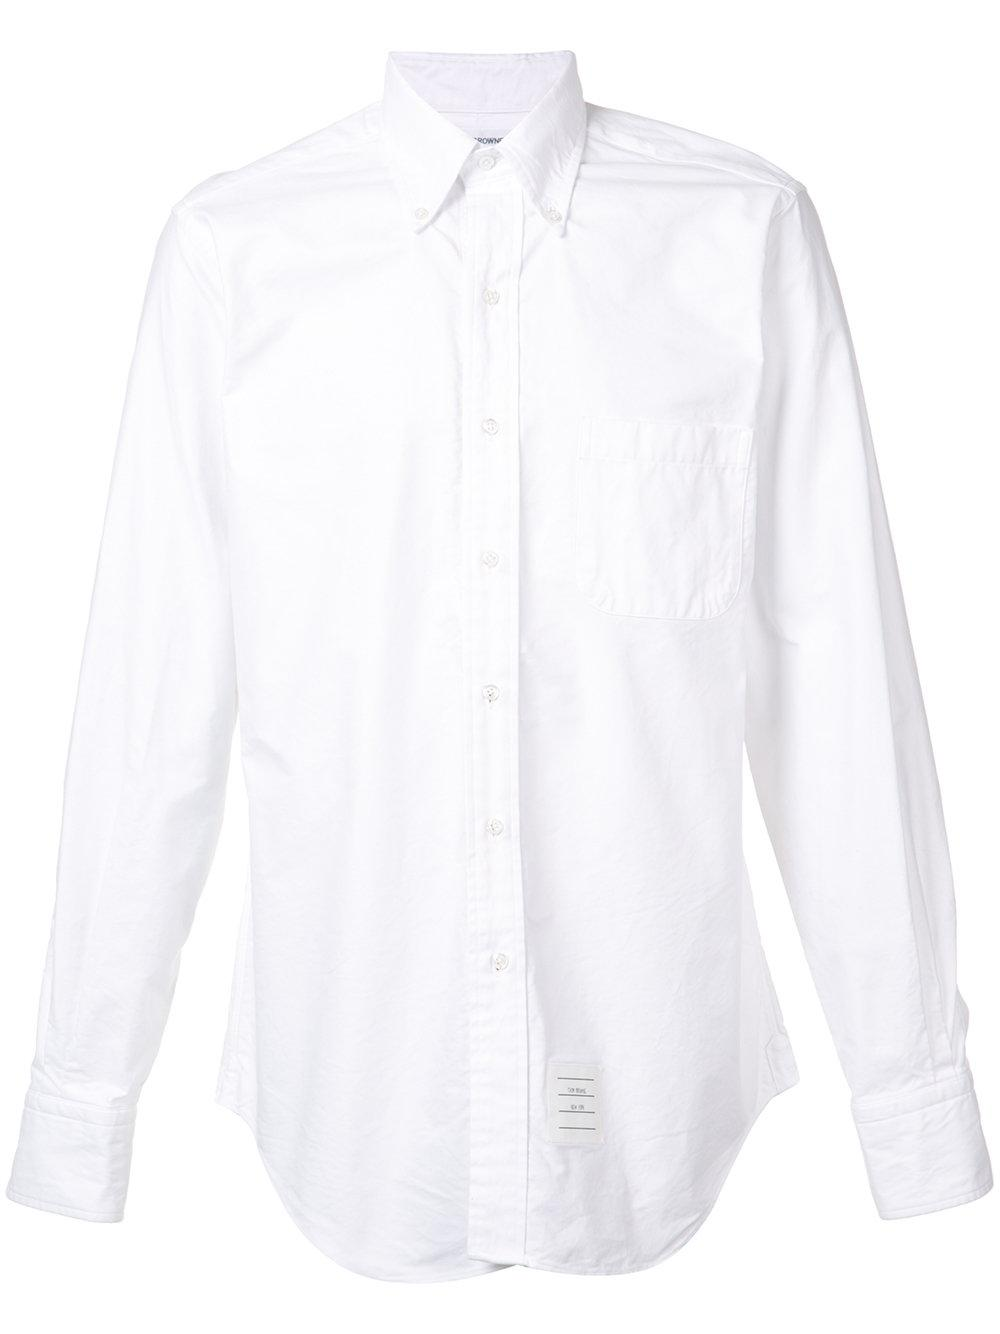 Thom browne stripe detail button down shirt in white for for Striped button down shirts for men